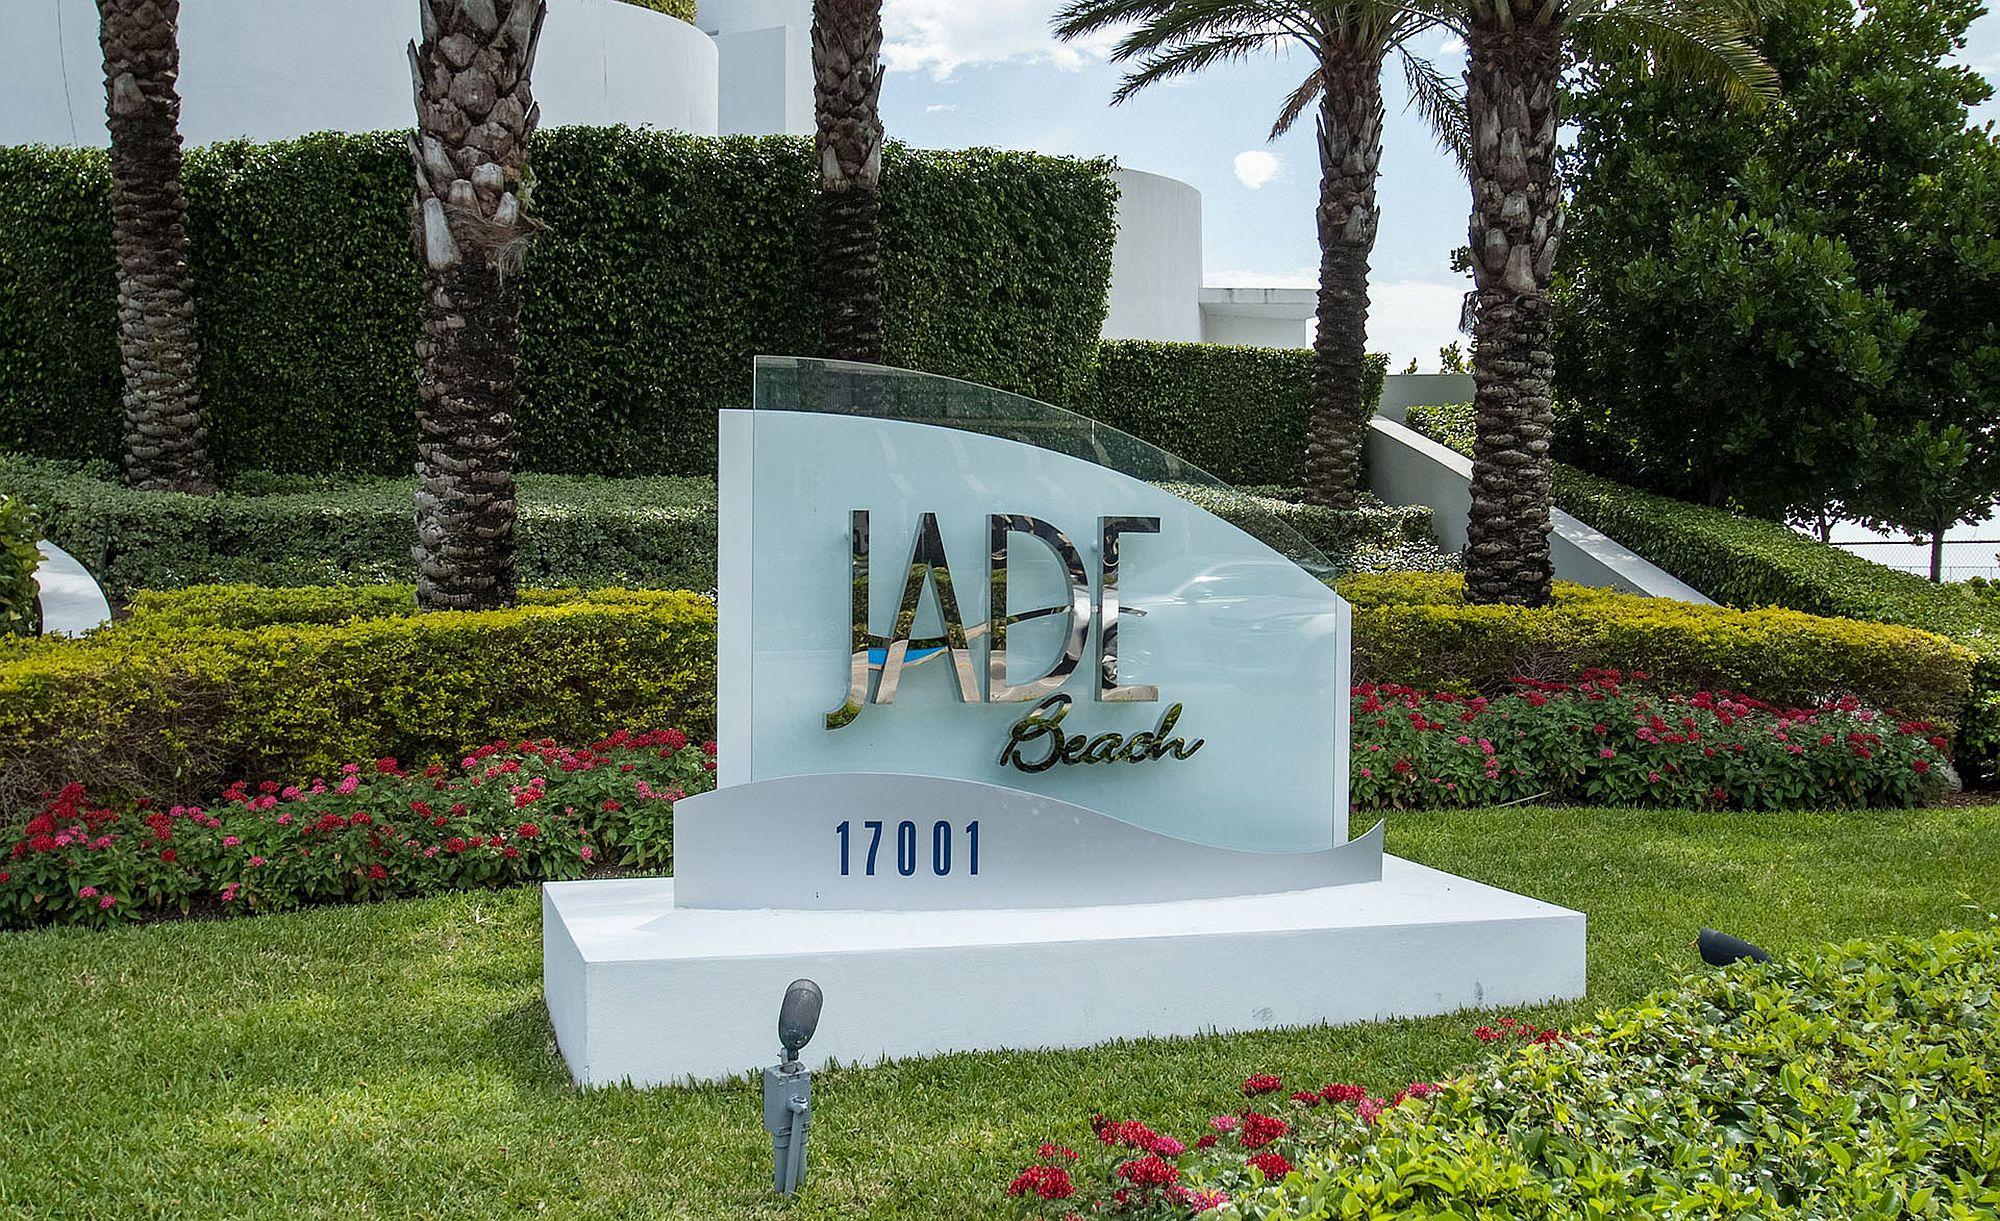 Luxury modern condos at Jade Beach, Florida